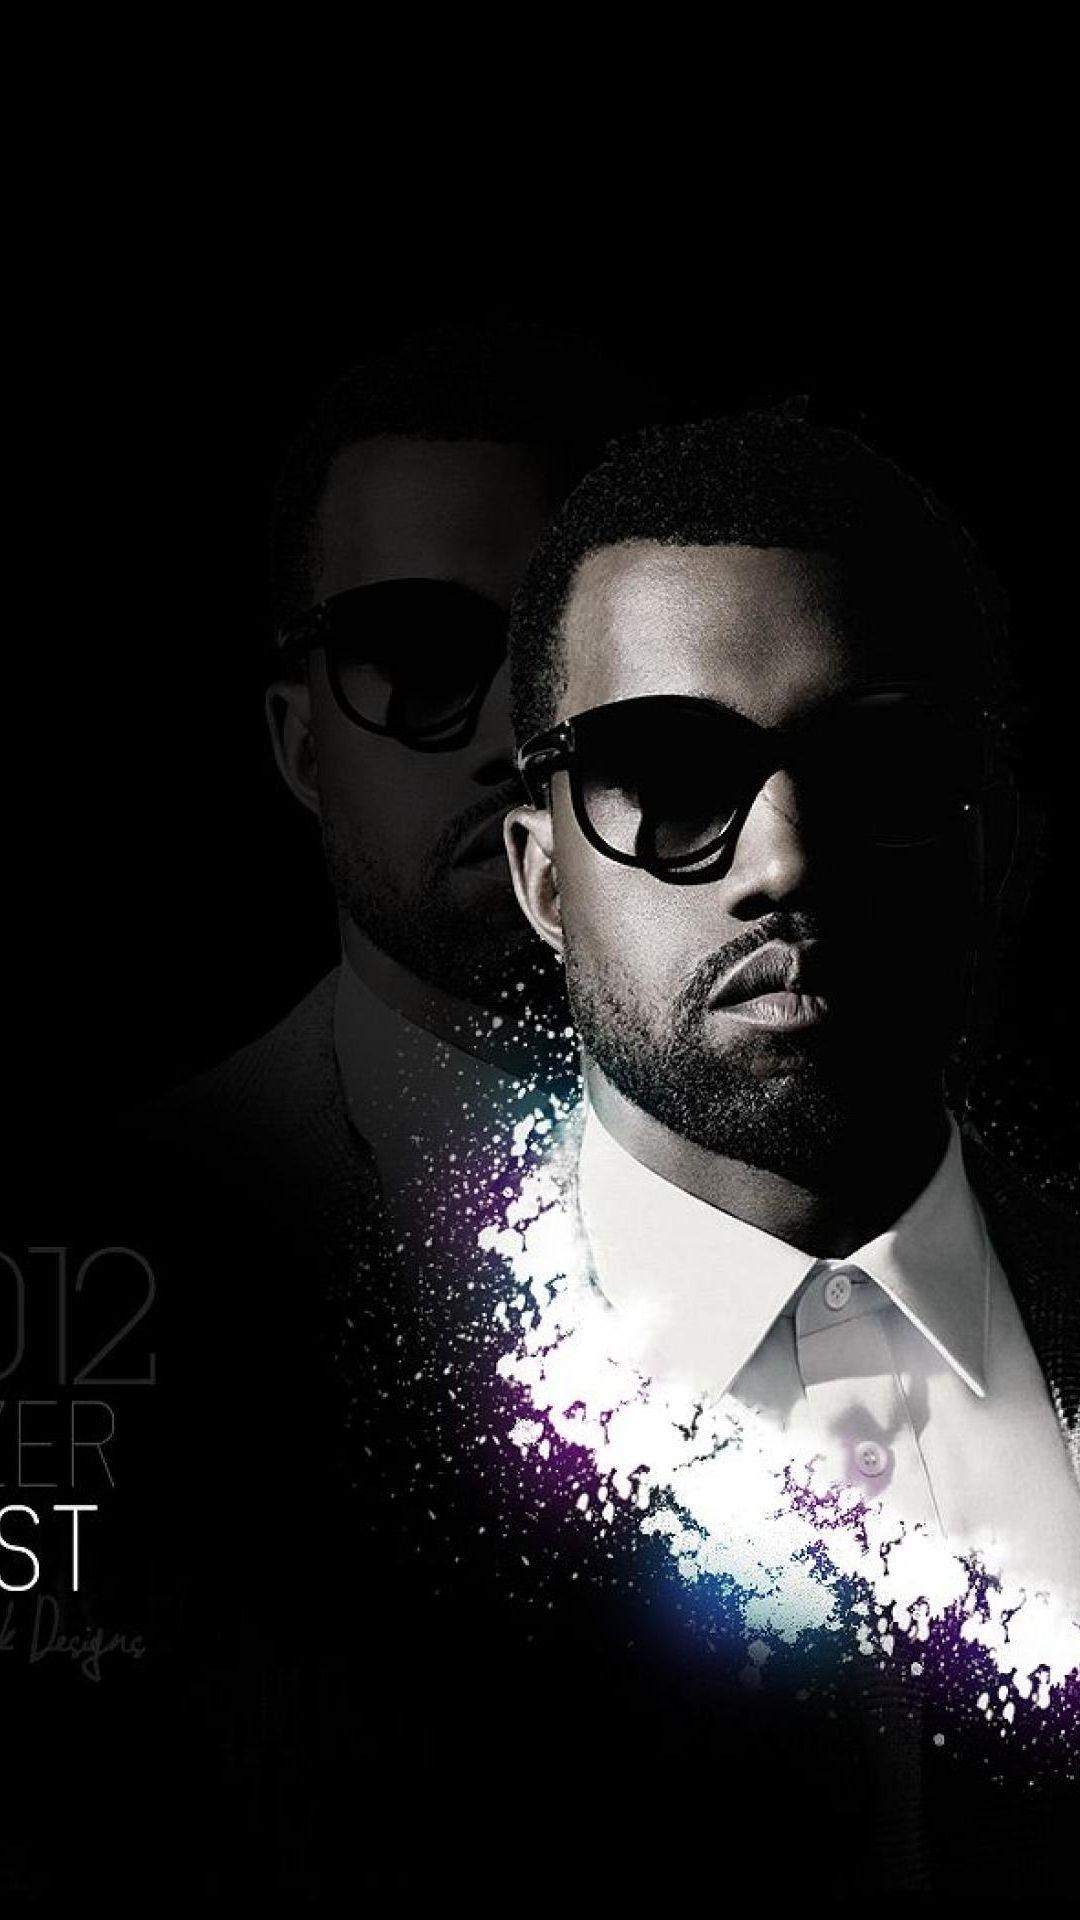 Kanye West iPhone 7 wallpaper hd